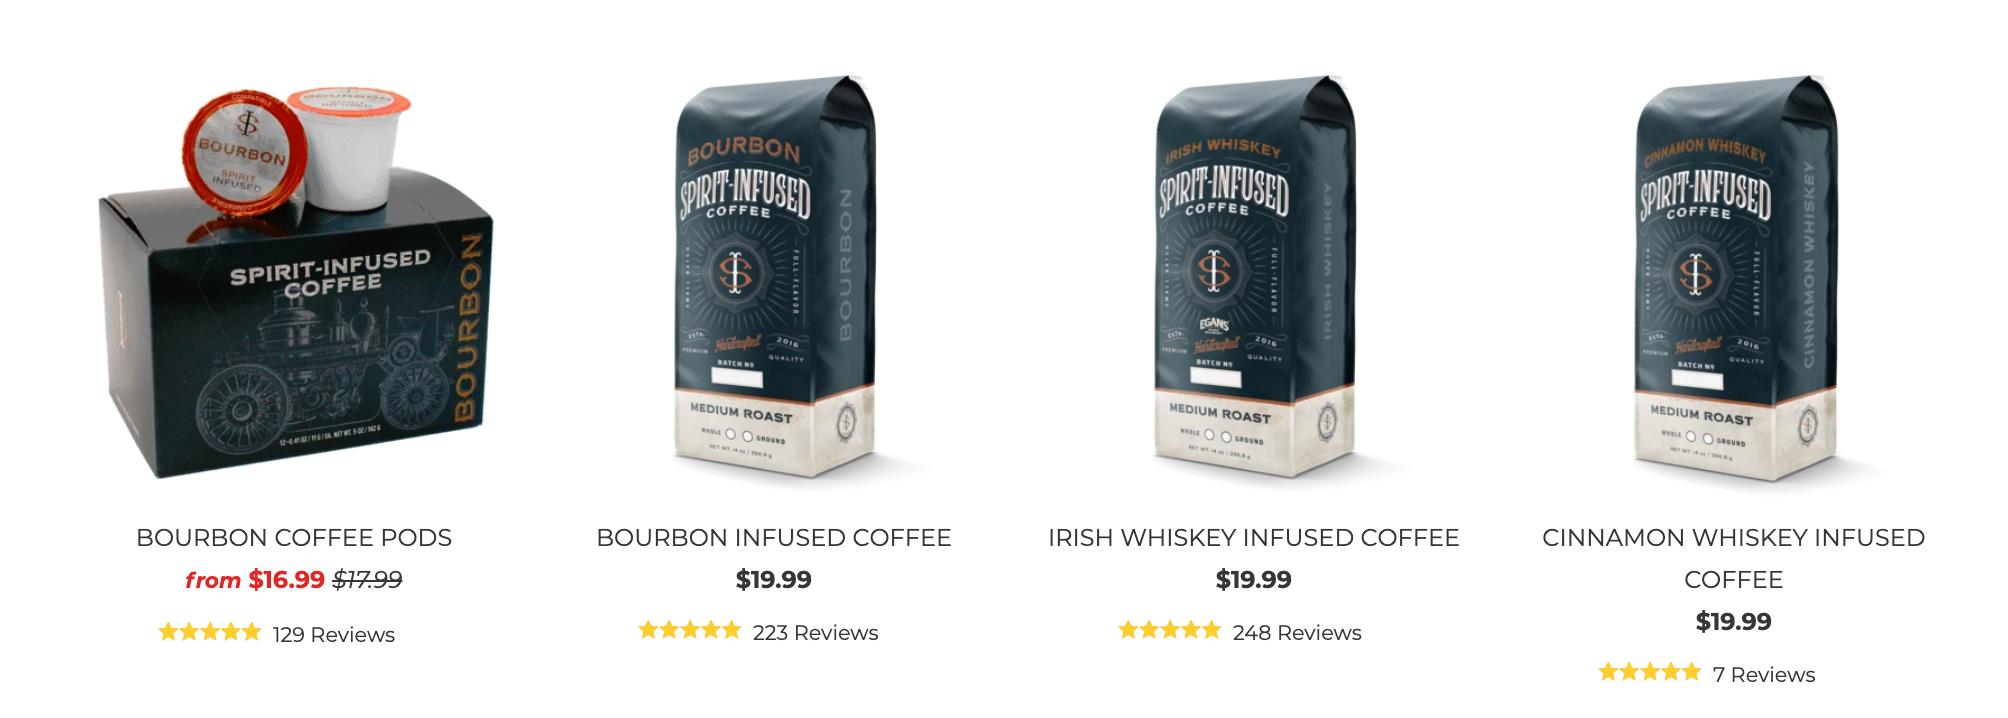 Spirit infused coffee bags